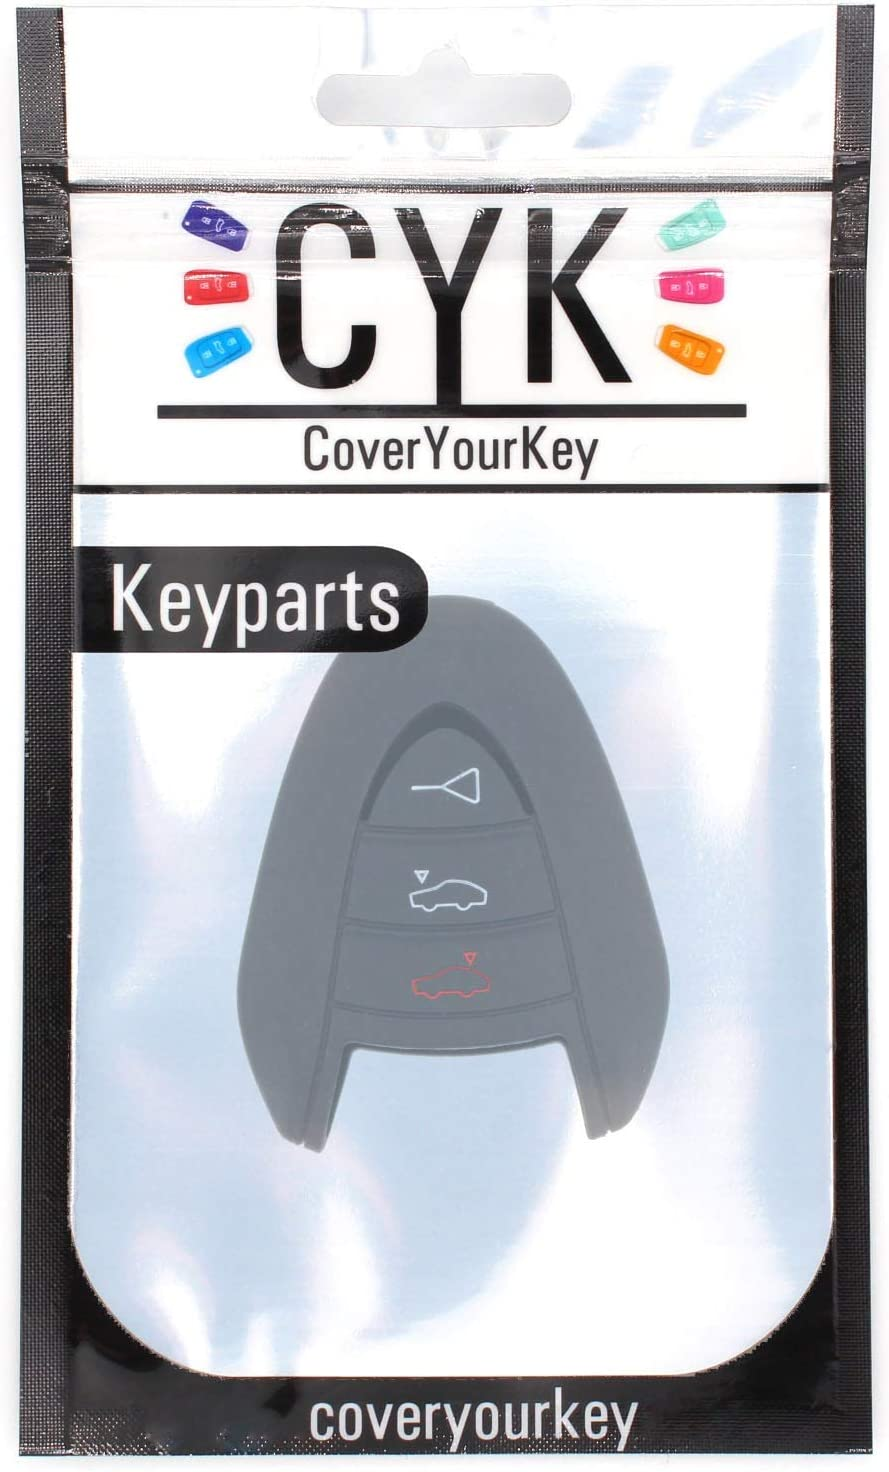 Finest-Folia Key Cover Silicone Black for Porsche B Cover 911 Boxster Targa Cayman 987/997/GTS